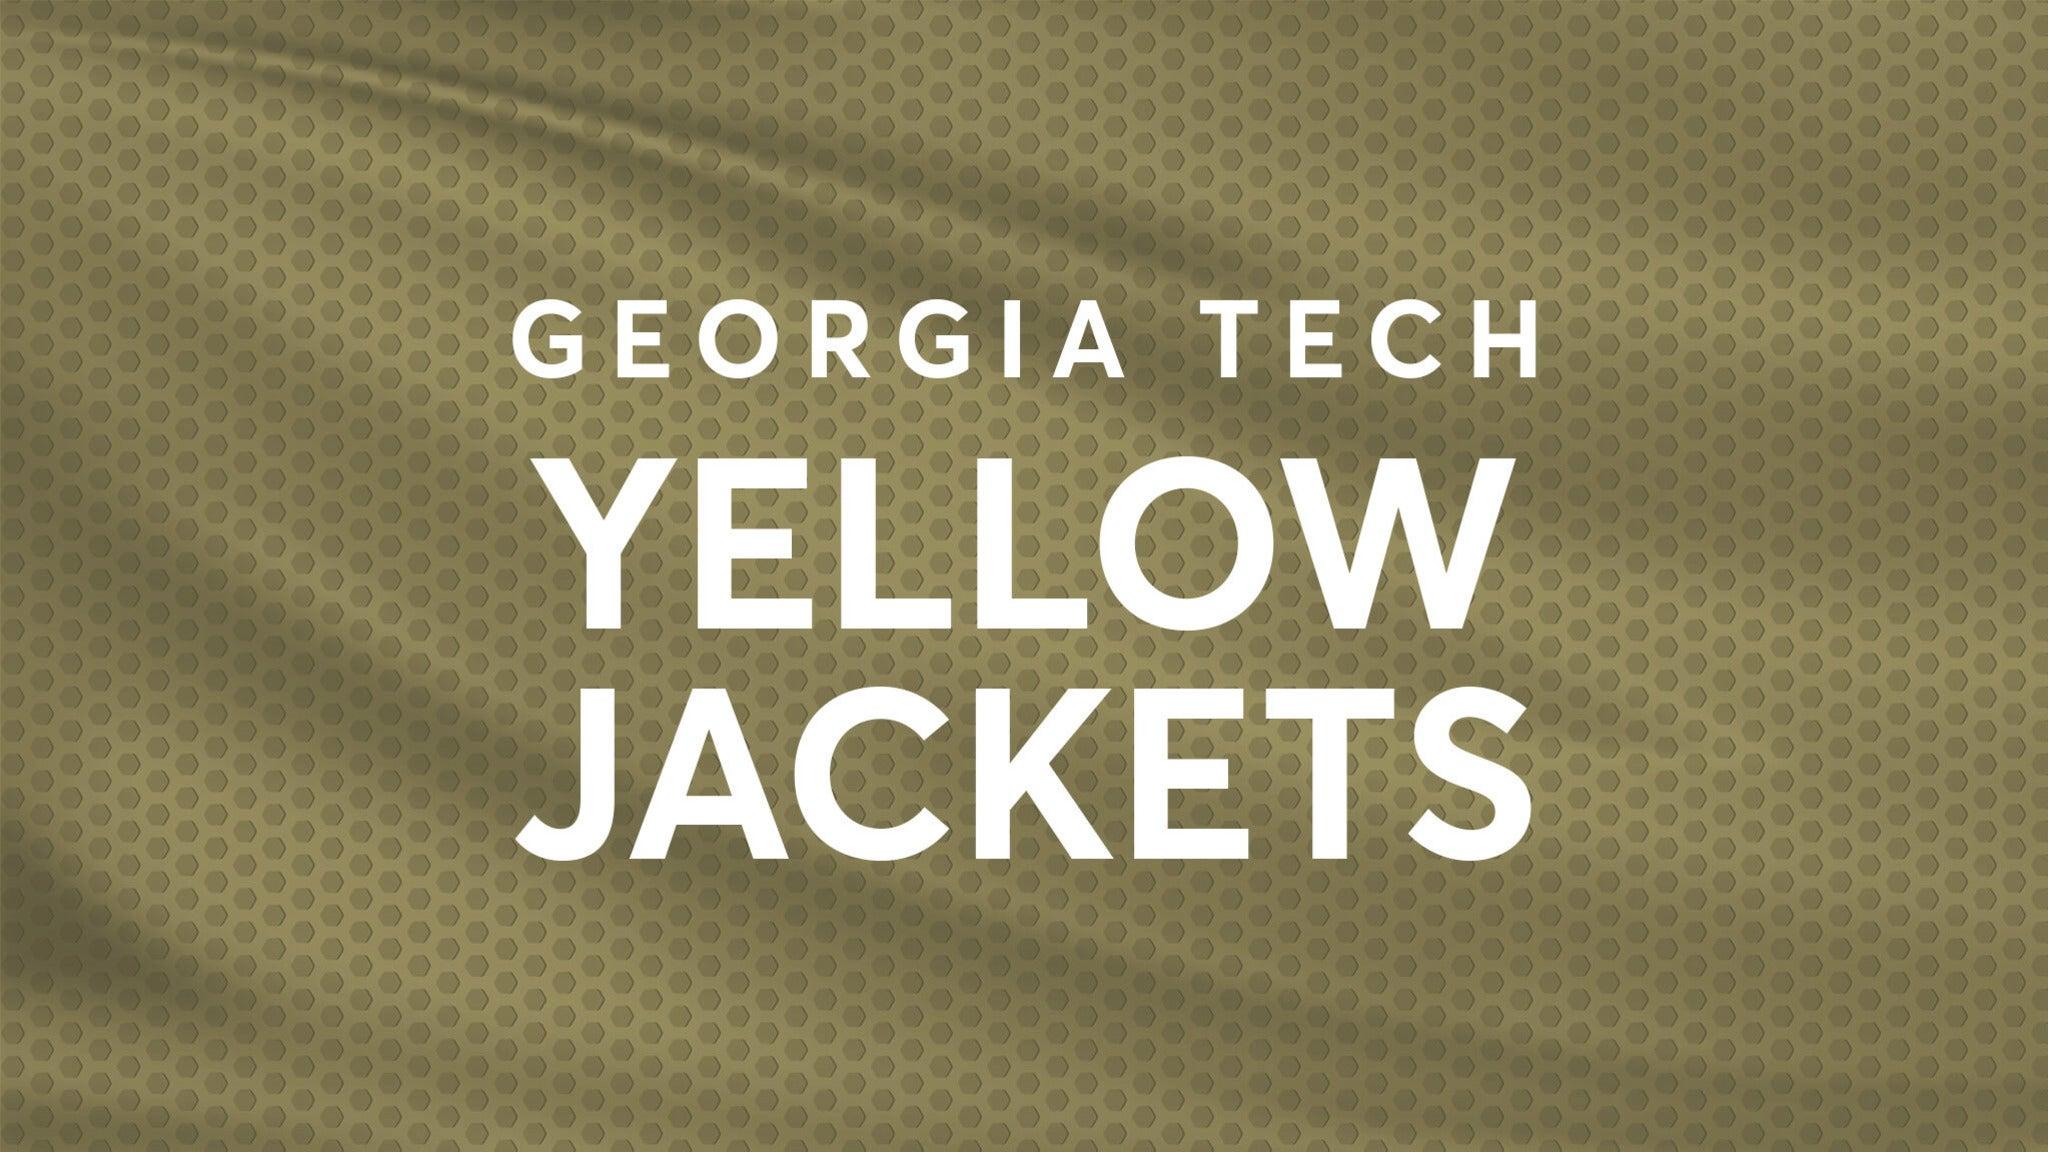 Georgia Bulldogs Football Tickets